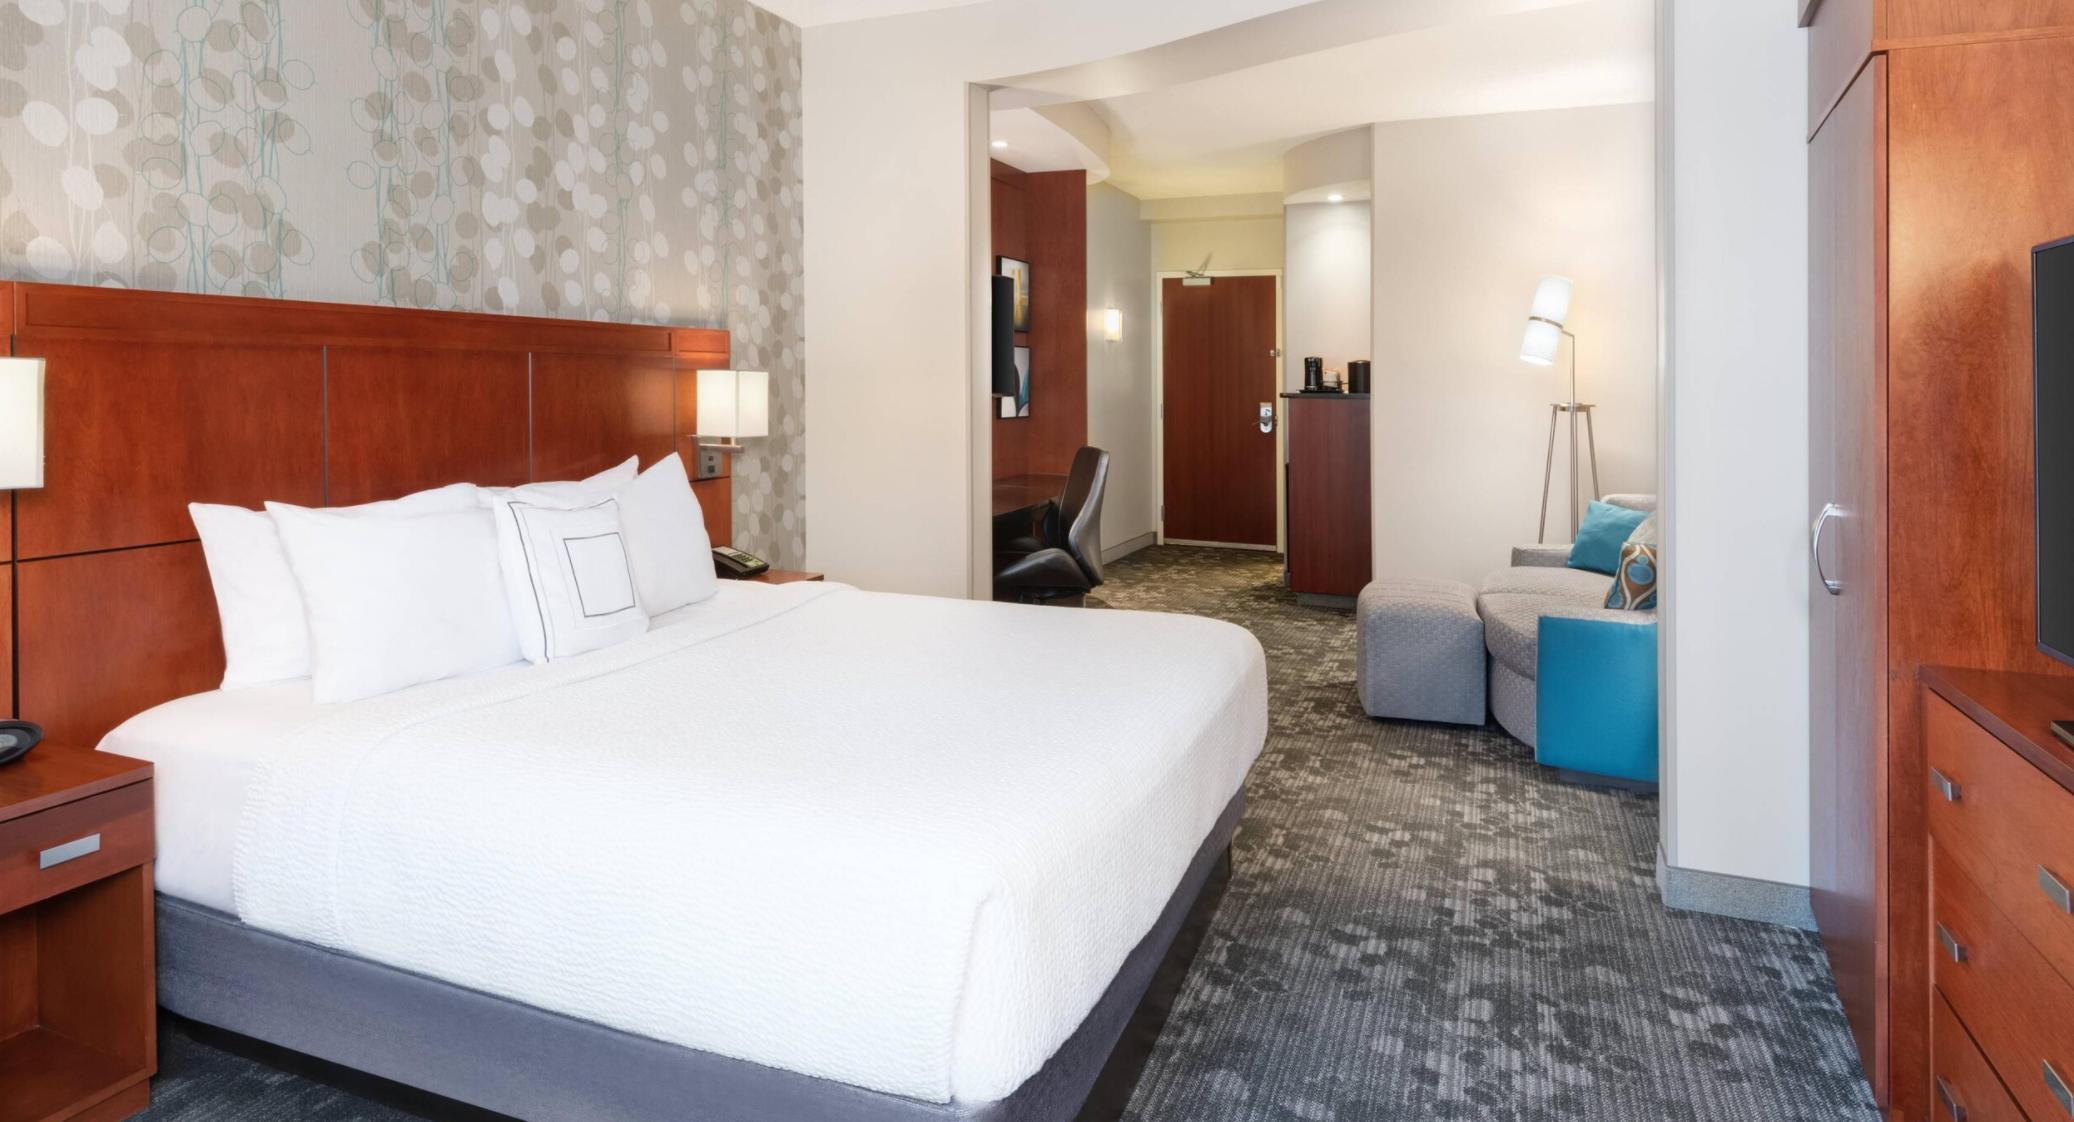 https://www.hotelsbyday.com/_data/default-hotel_image/3/18065/screenshot-2020-06-10-at-7-00-39-pm.png